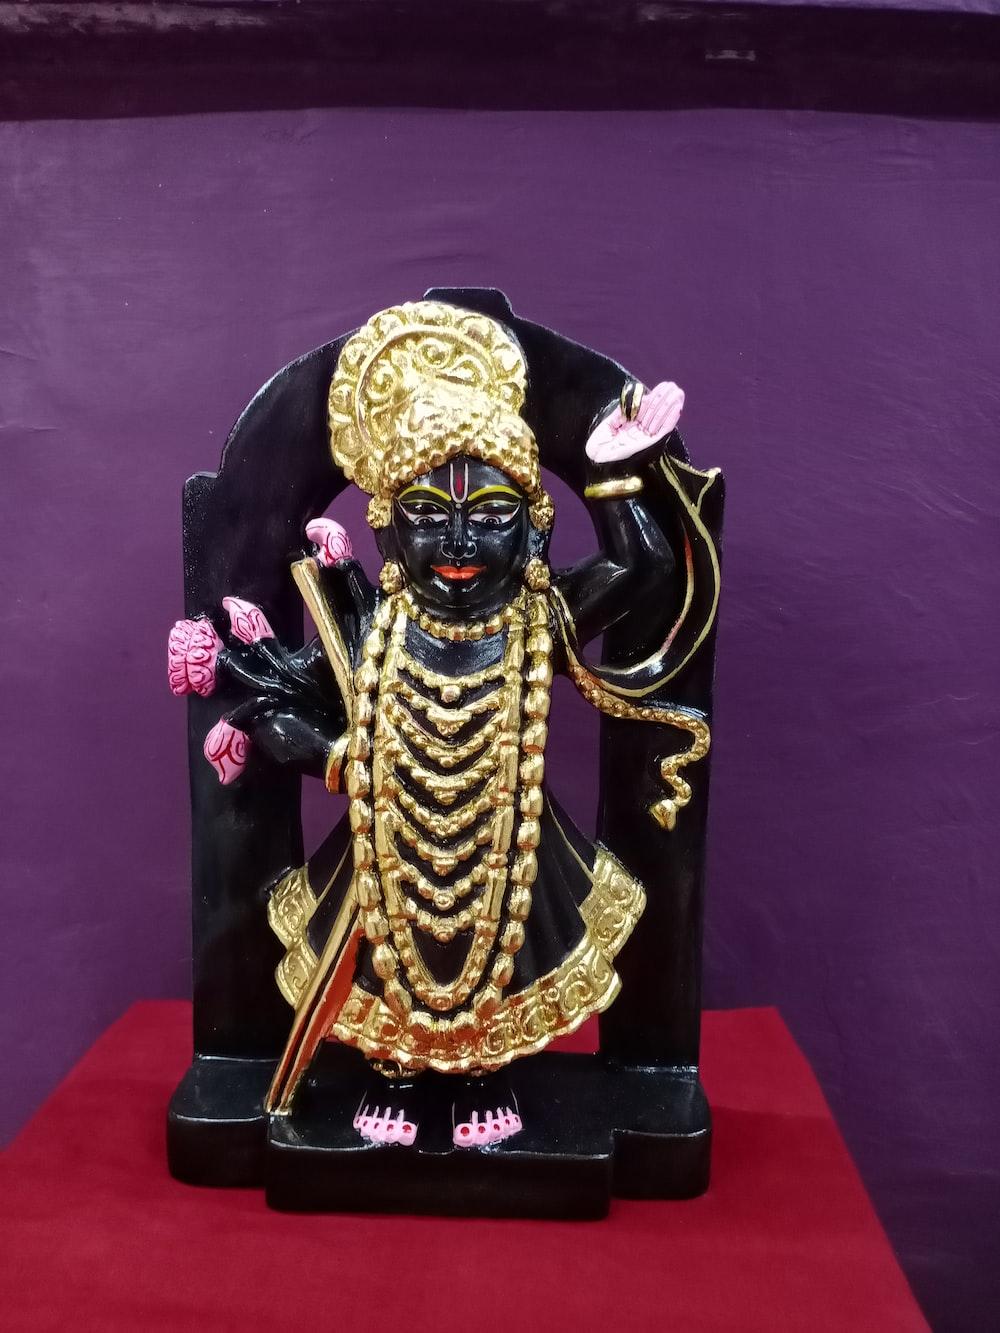 gold and black hindu deity figurine